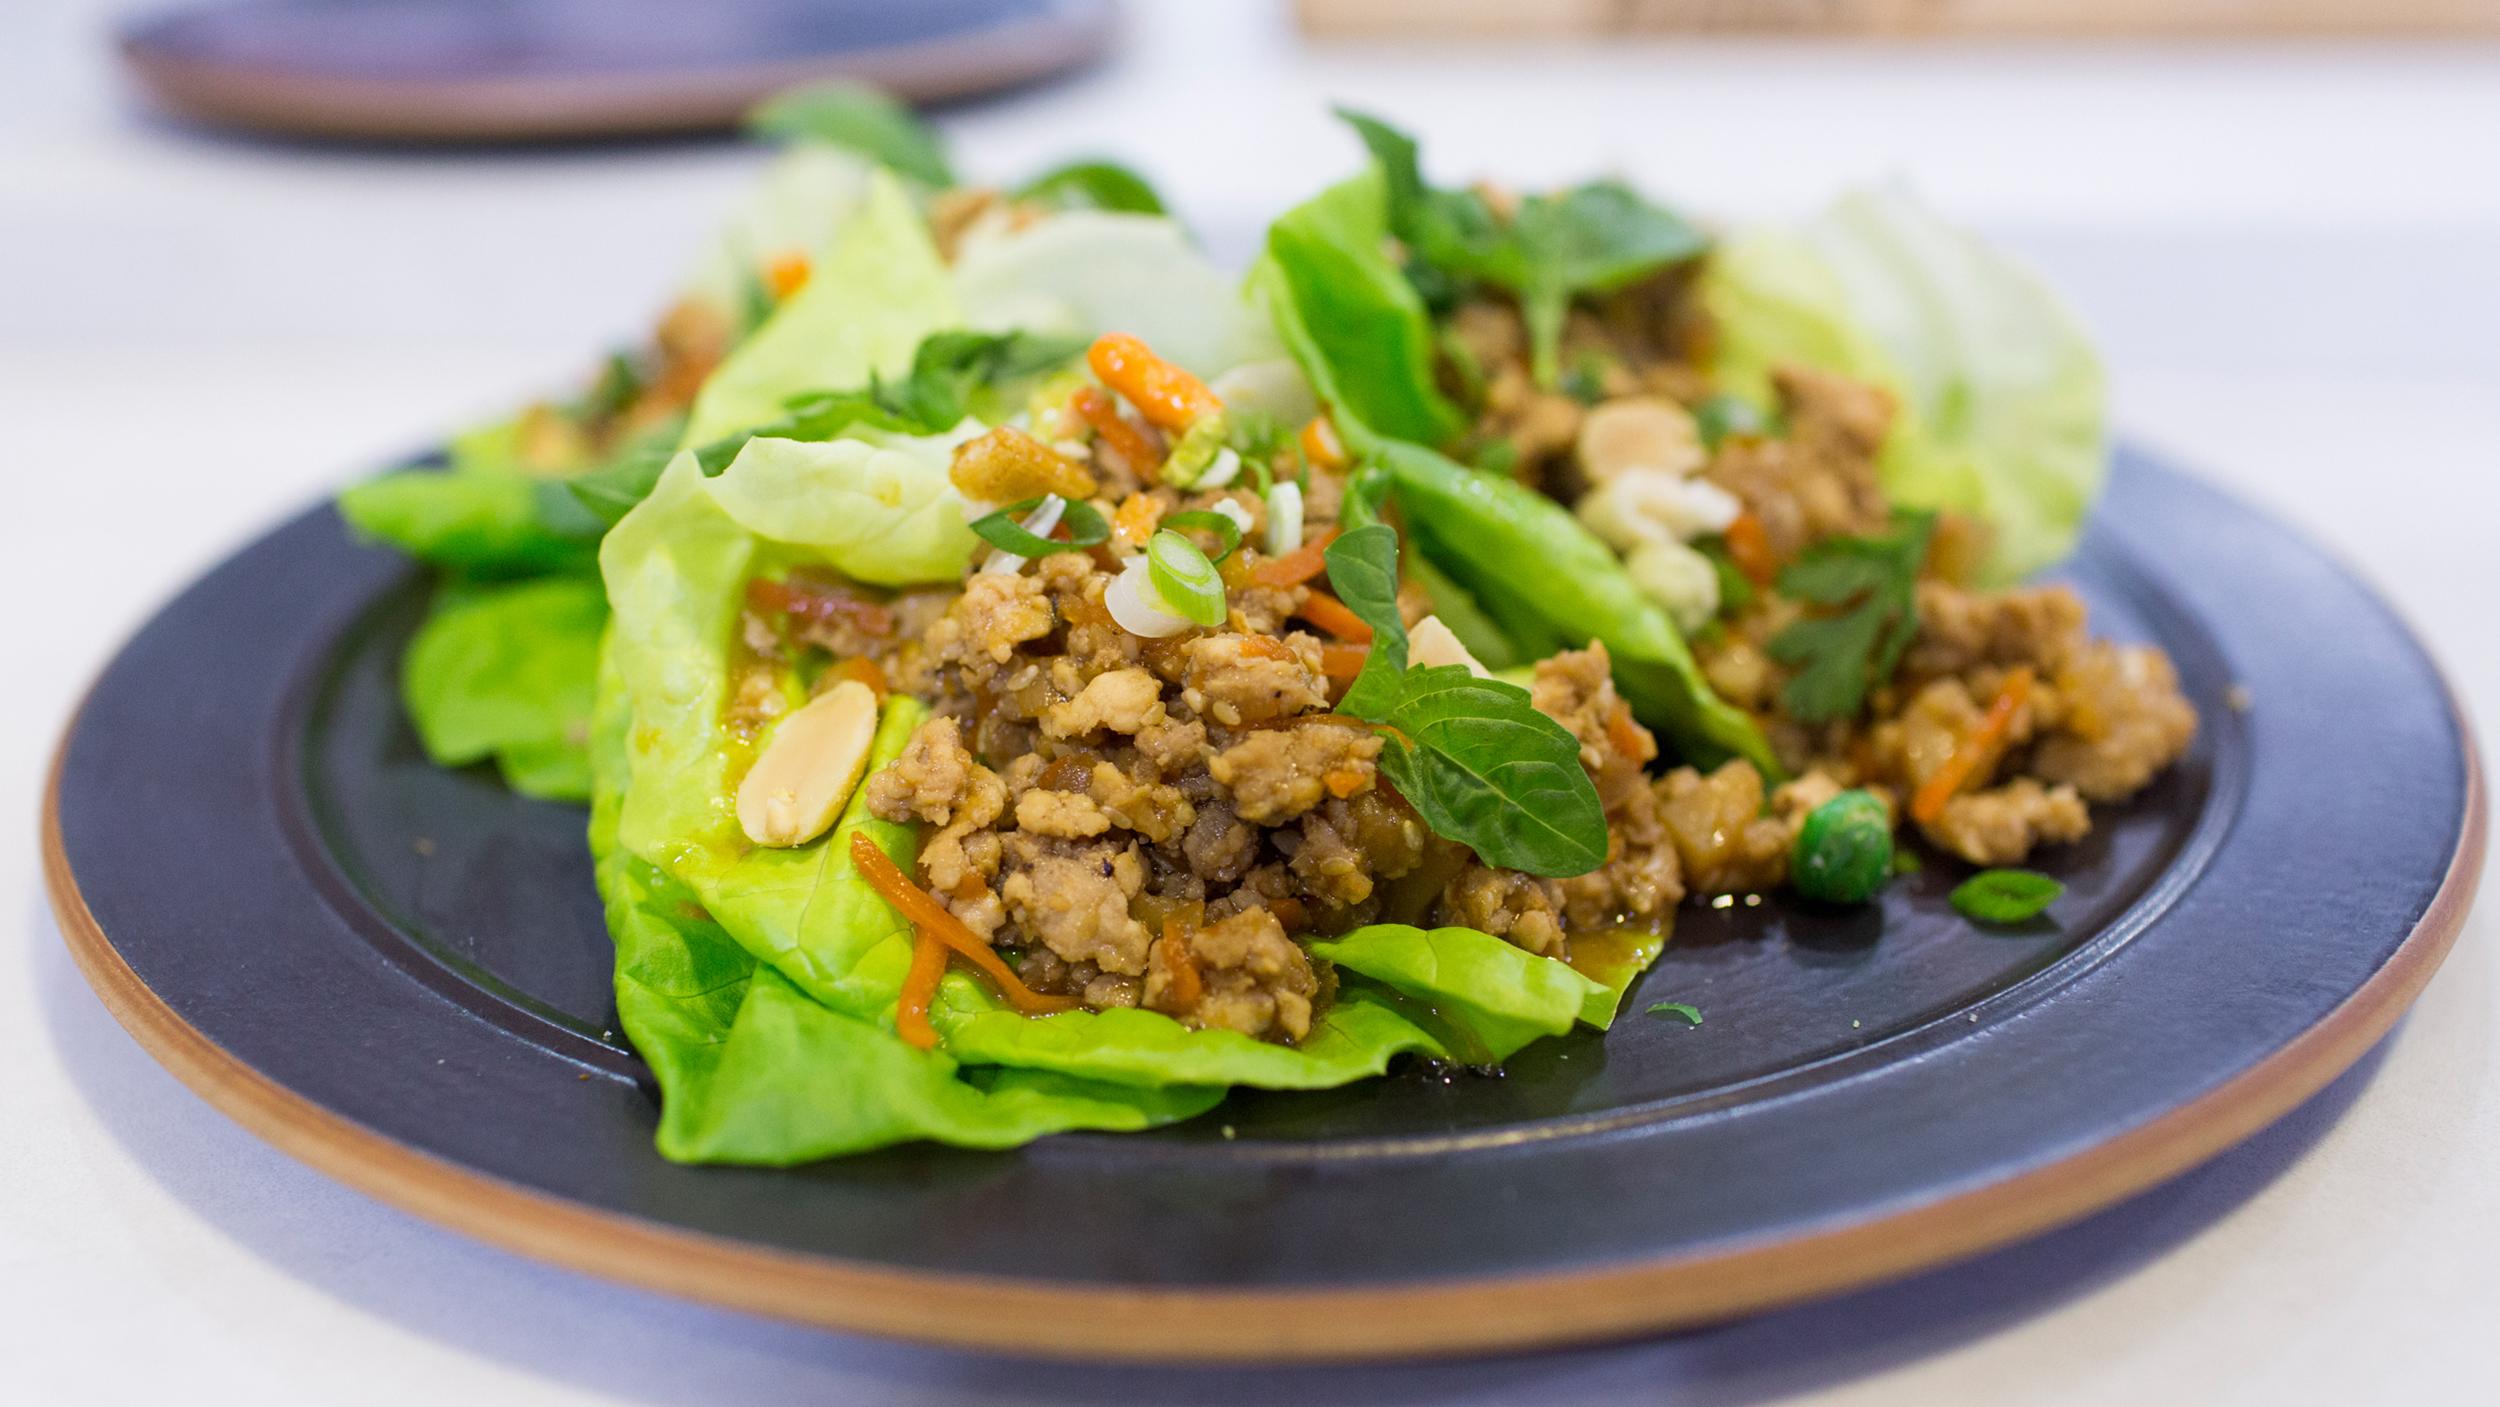 Pf changs lettuce wraps nutrition